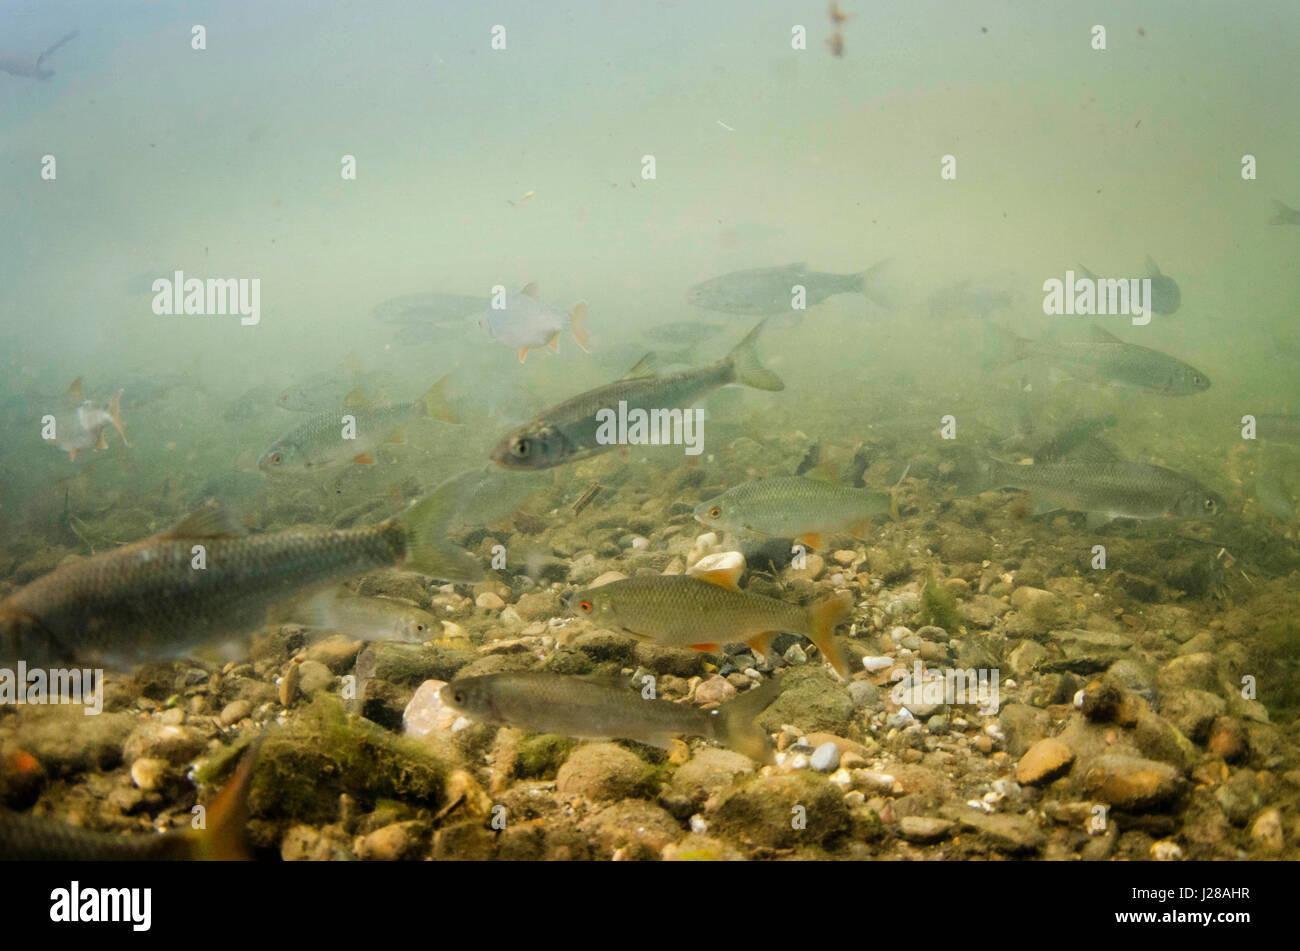 Freshwater fish dace - Shoal Of Roach Dace Stock Image